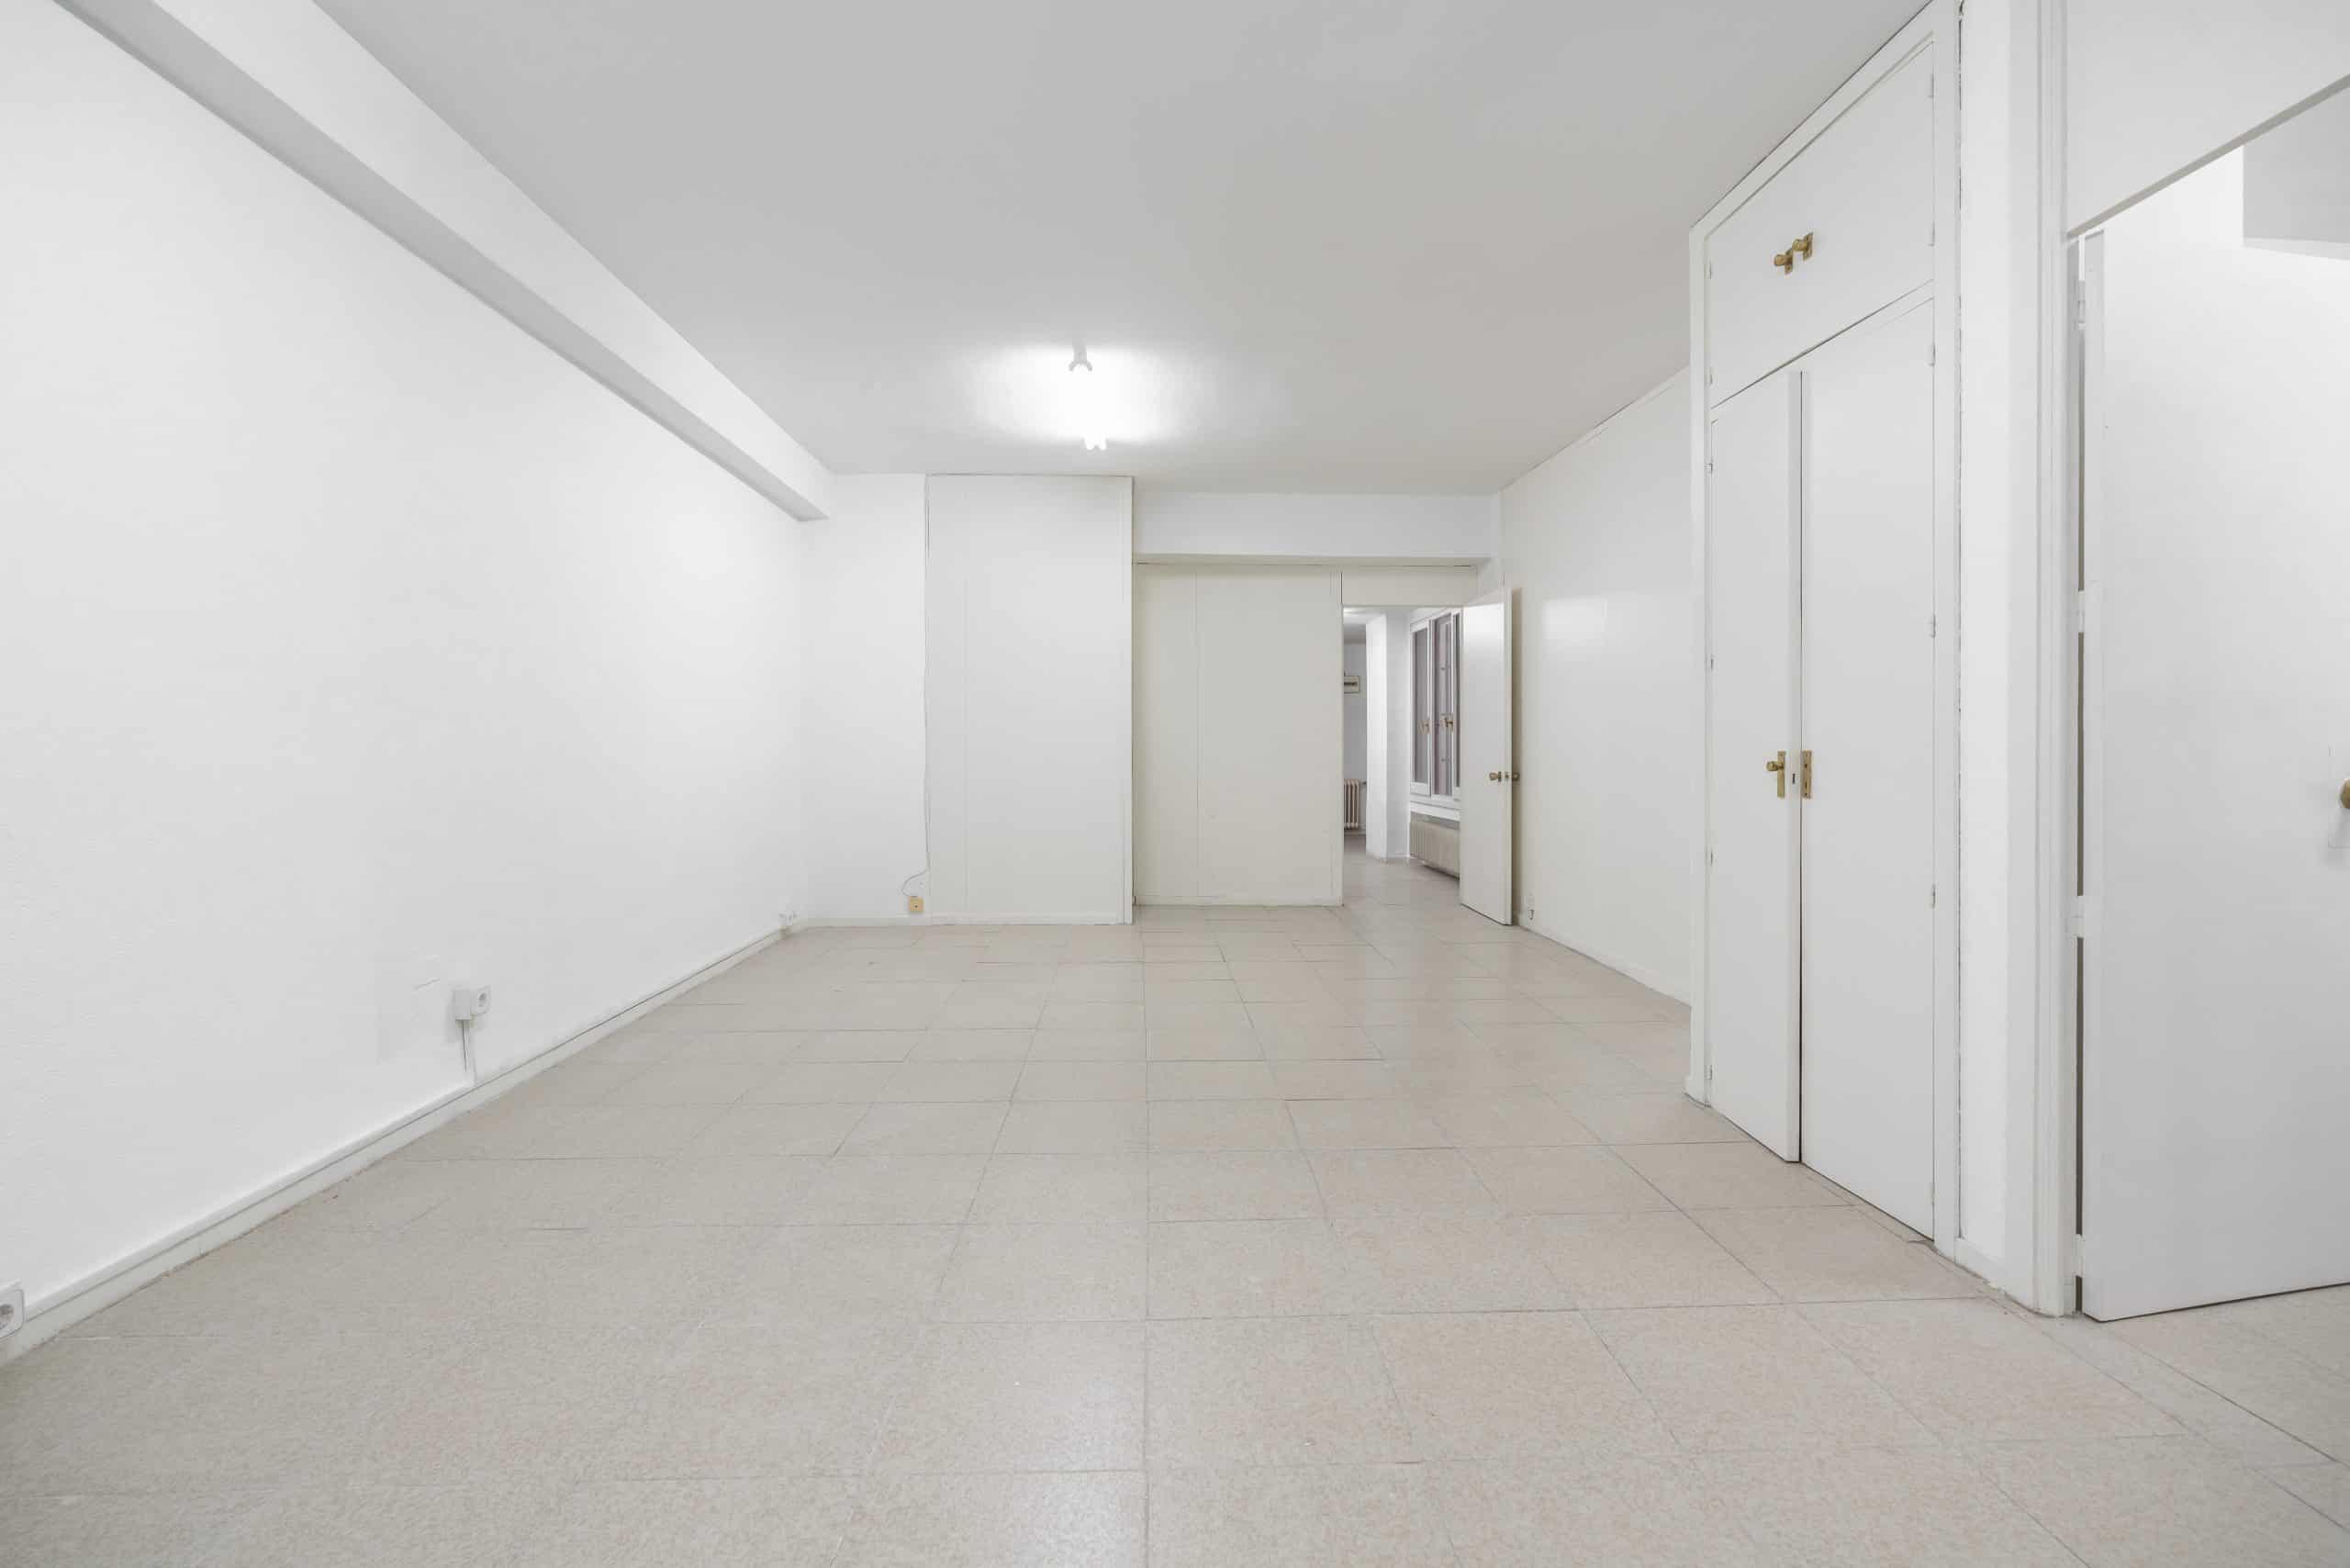 Agencia Inmobiliaria de Madrid-FUTUROCASA-Zona ARGANZUELA-LEGAZPI -calle Modesto Lafuente 41,1ºC estancia 5